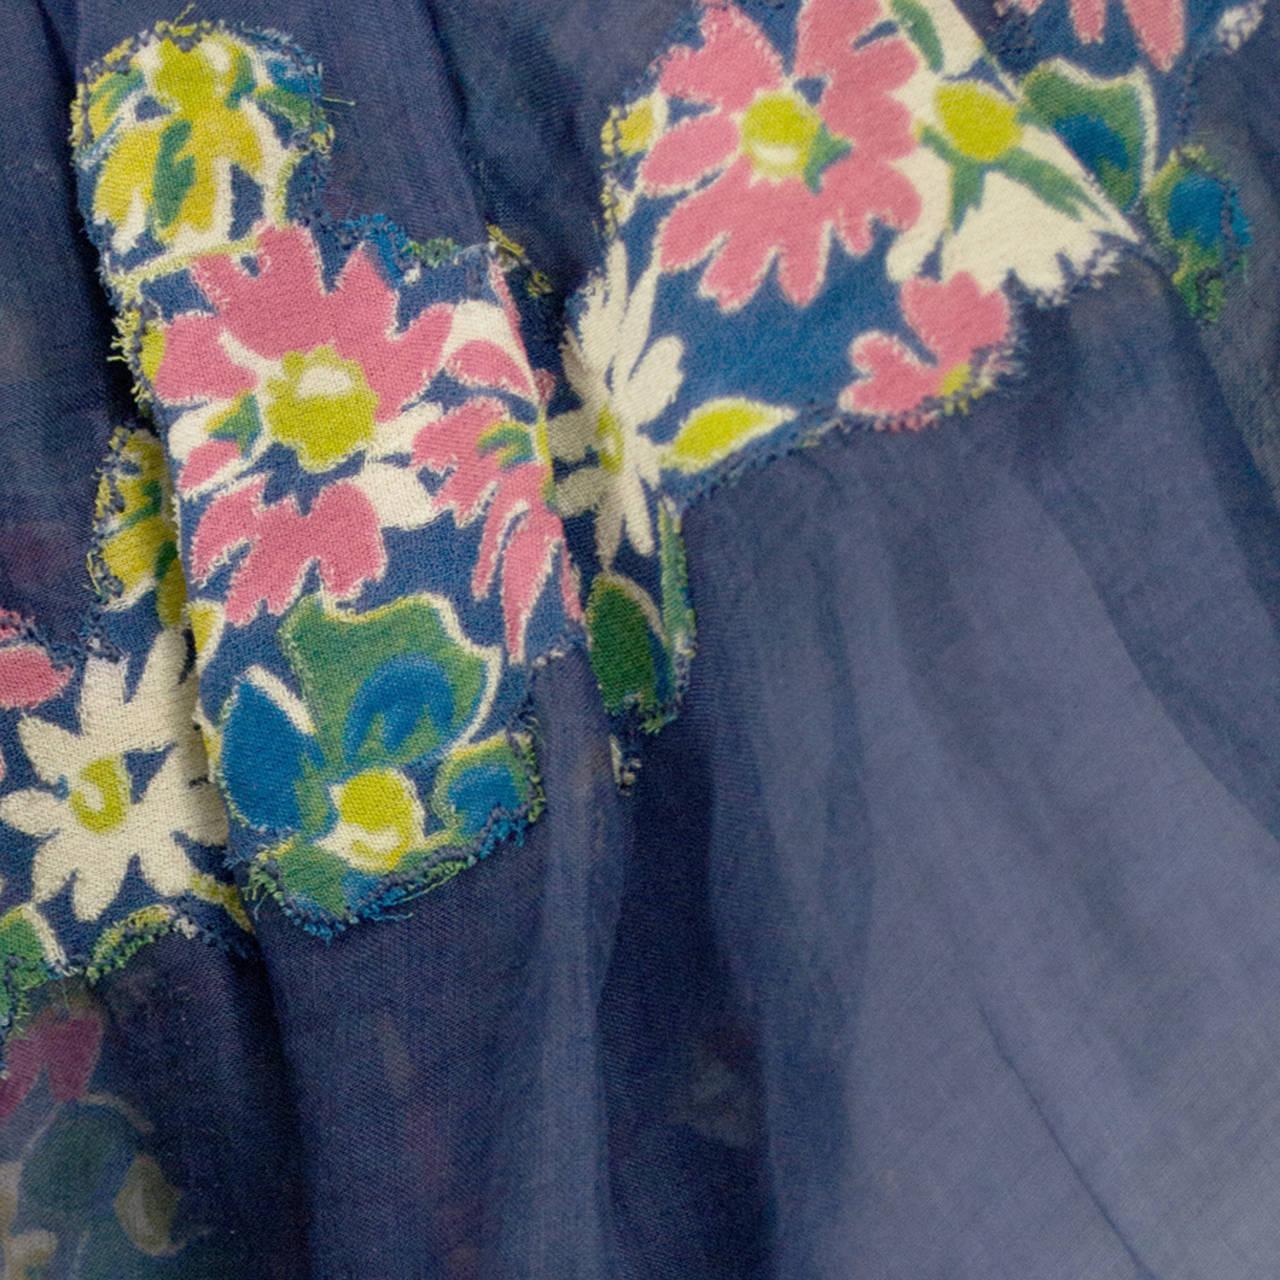 Rare 1930s Vintage Chanel Adaptation Dress Floral Velvet Applique Silk Organza 7